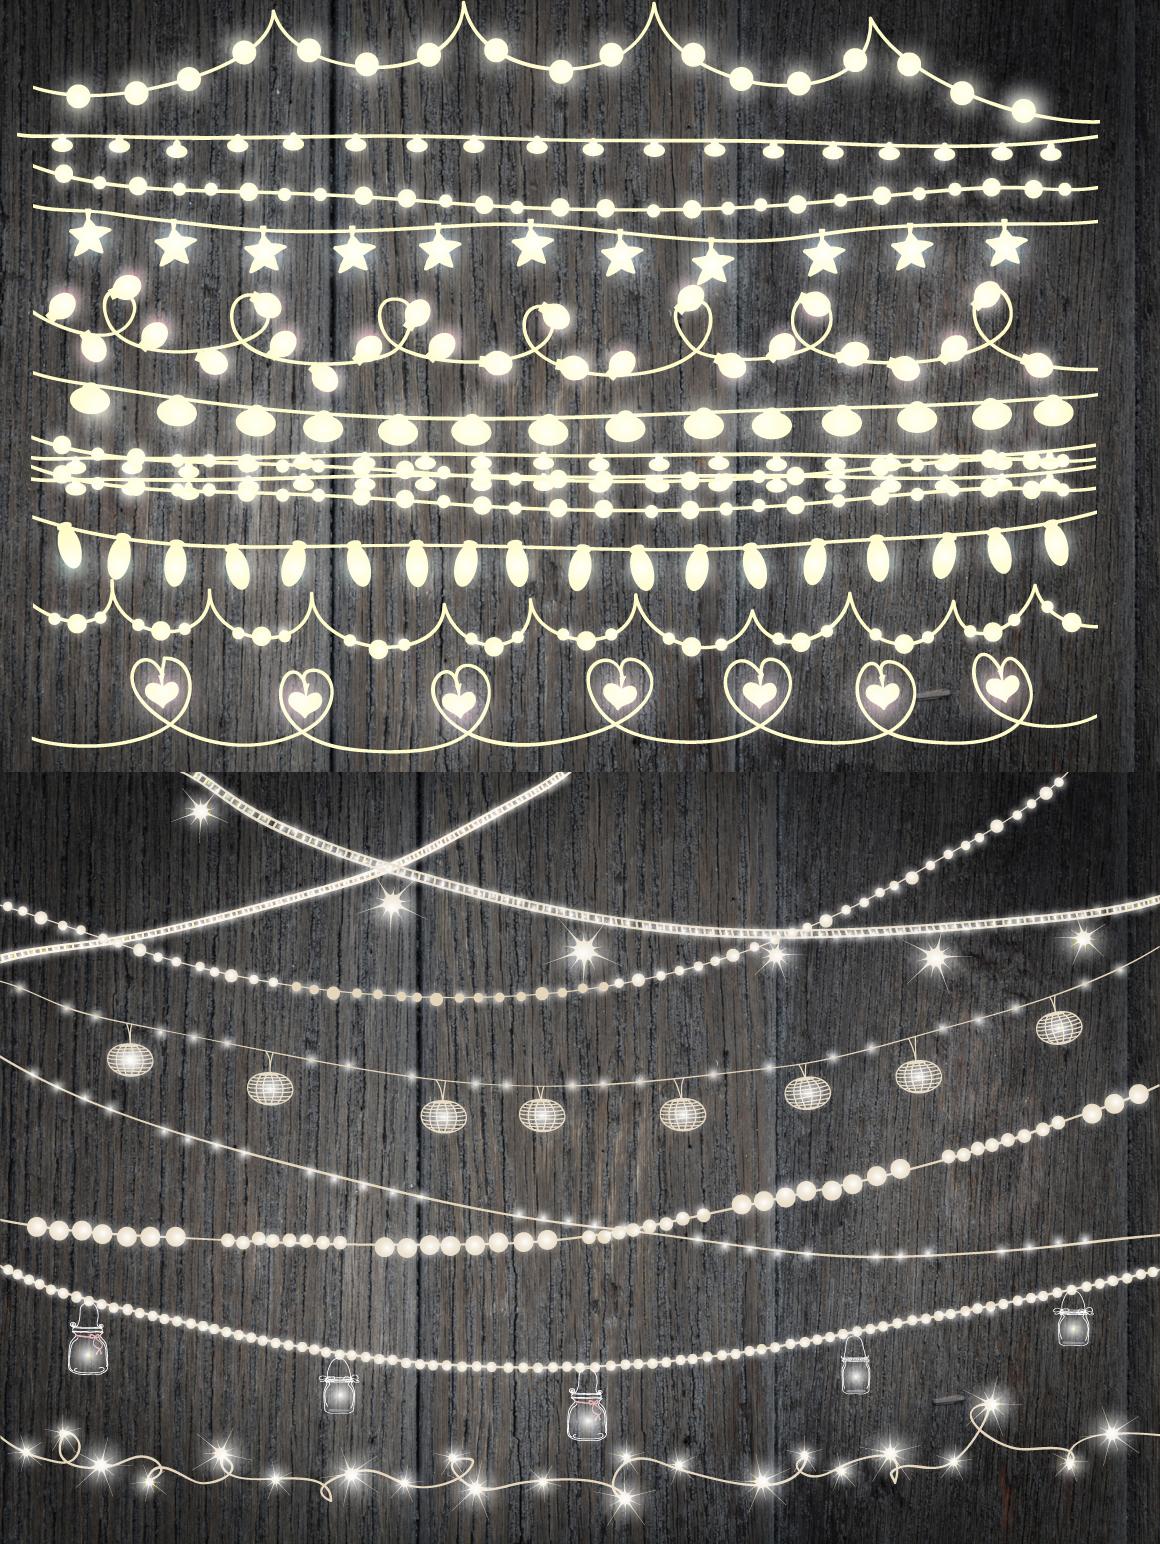 Lights Clipart, Fairy Lights Clipart Clip Art, String Lights.